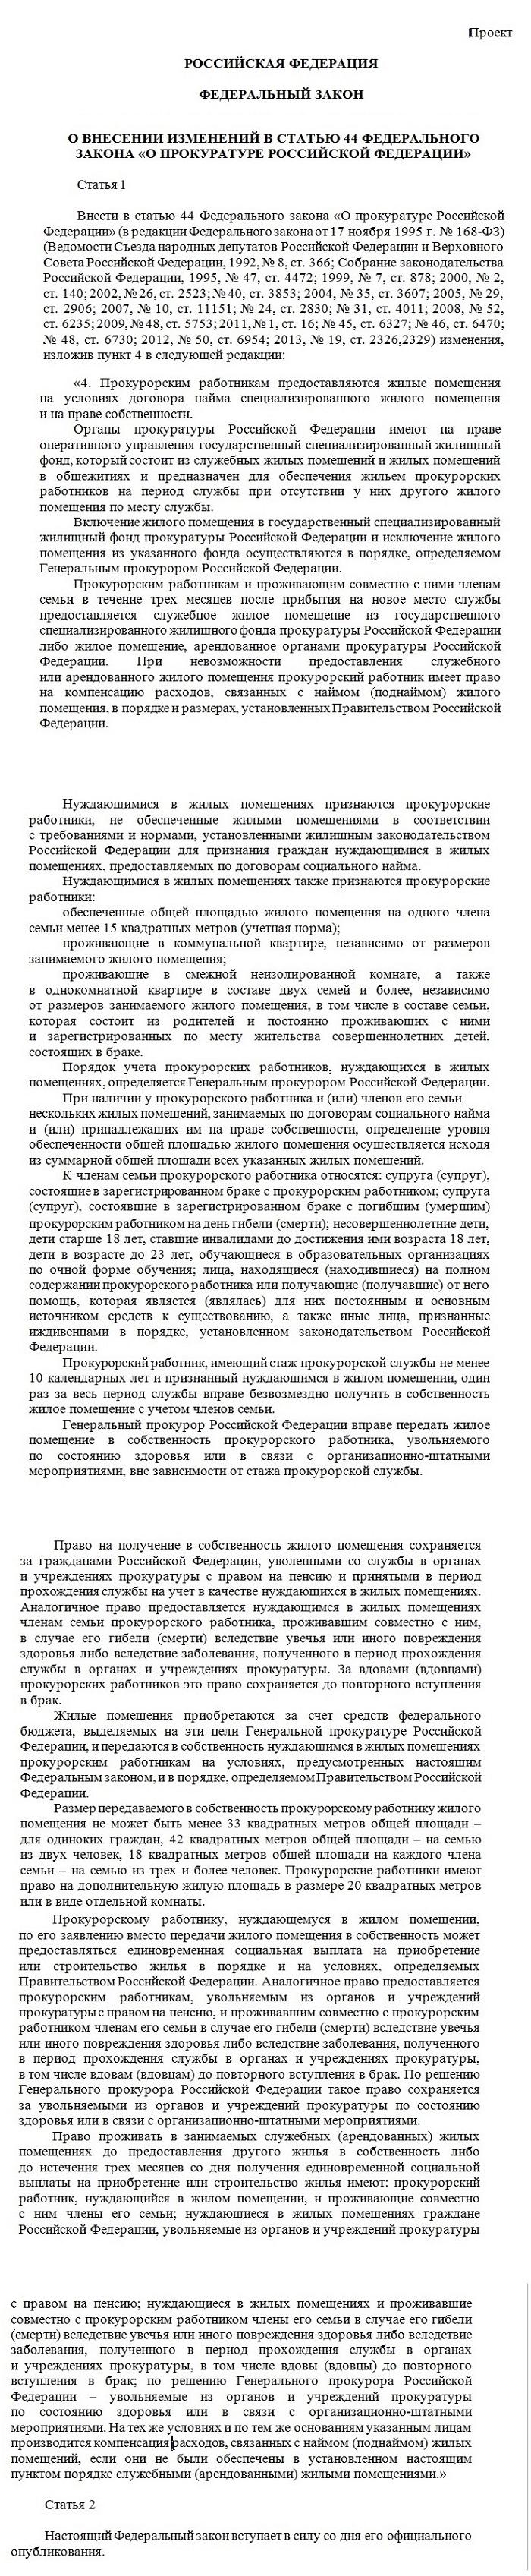 Законопроект